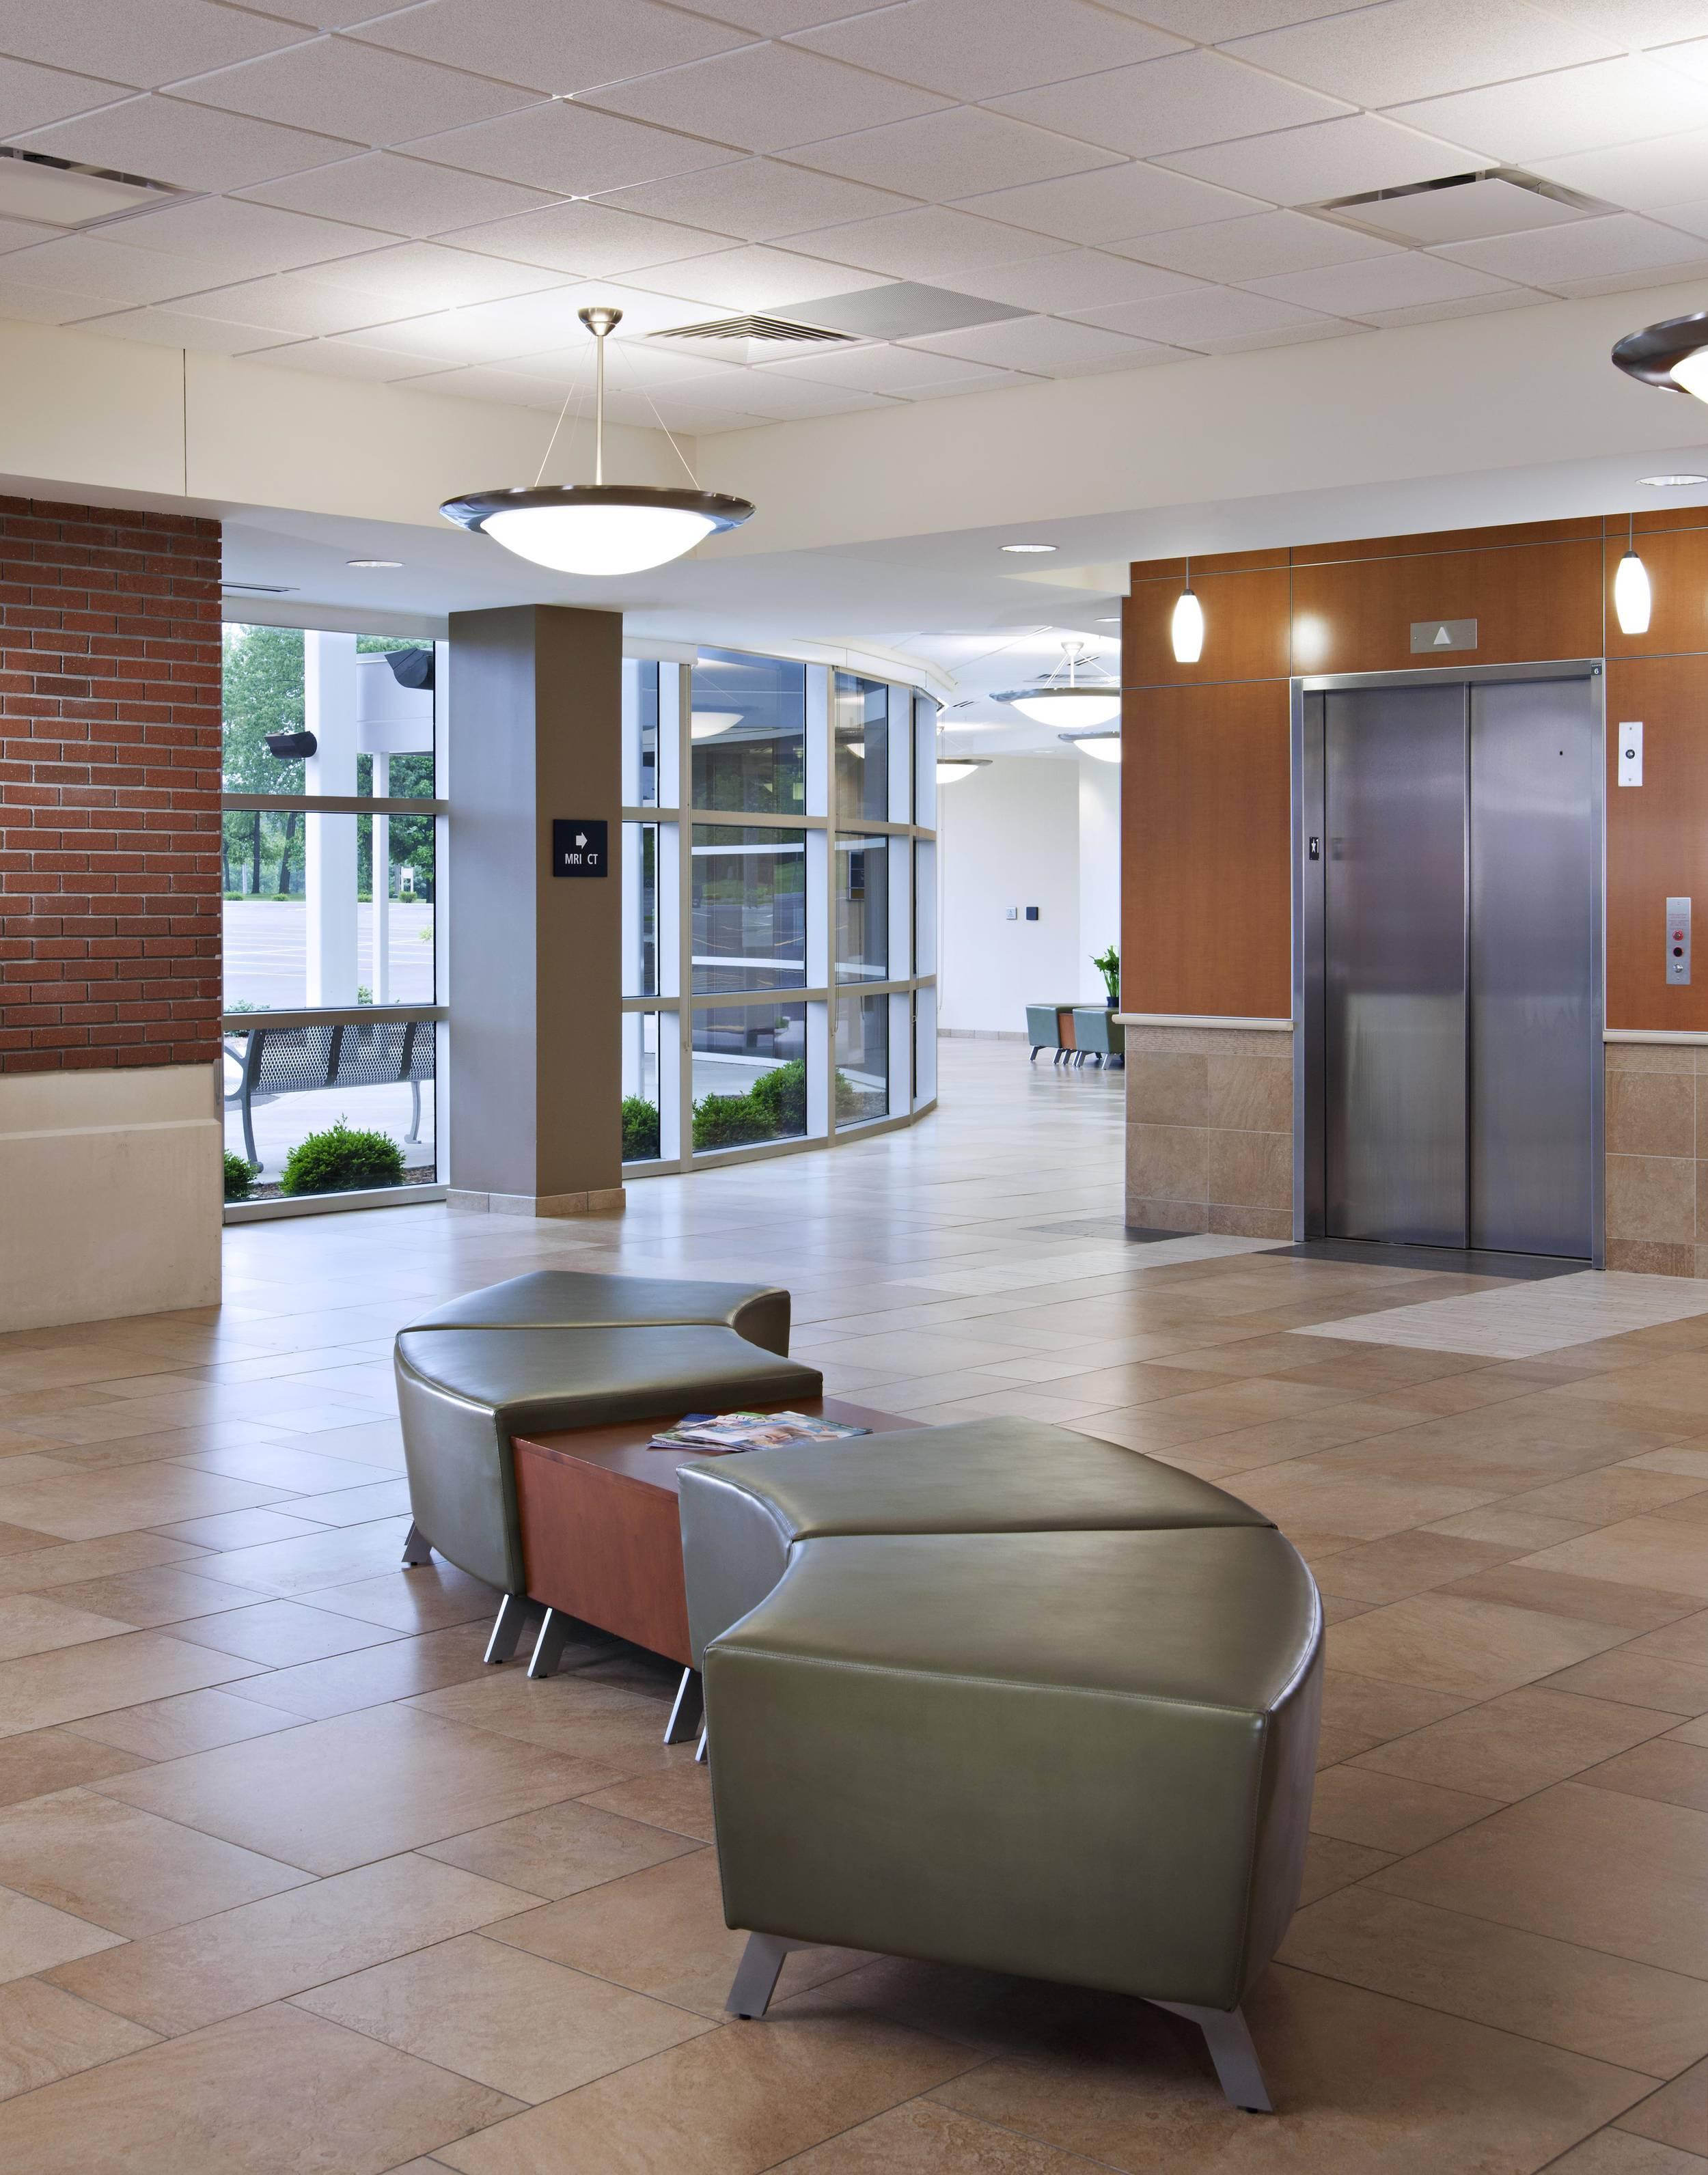 Interior_Lobby 1.jpg